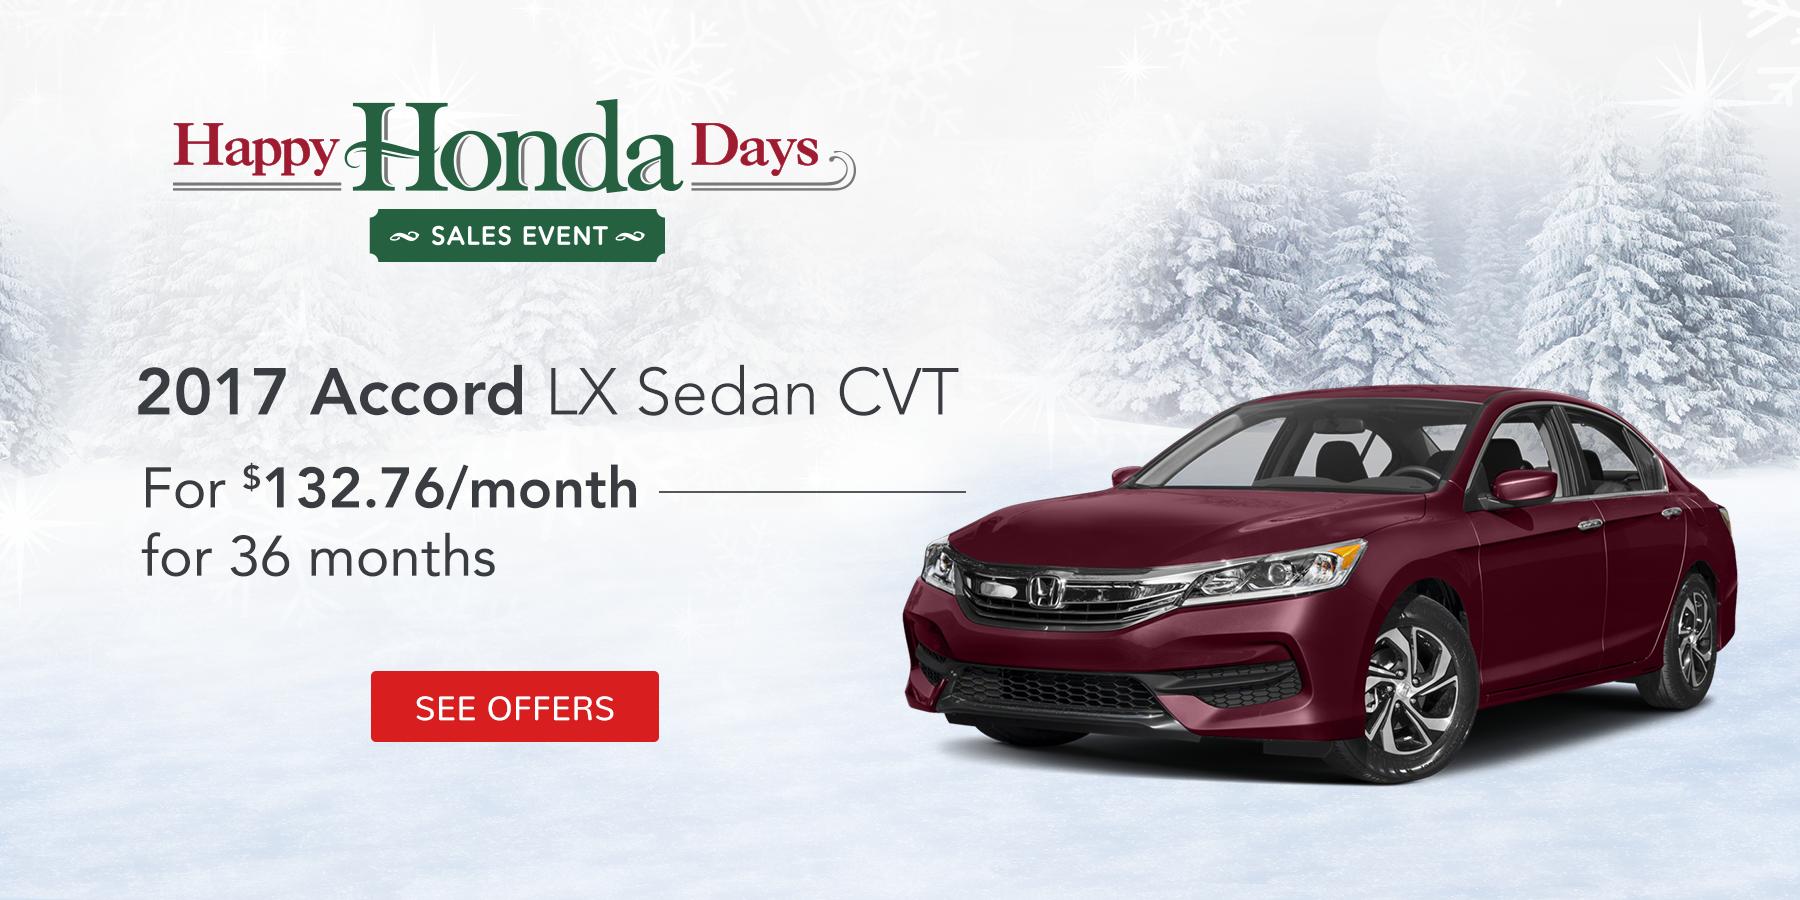 Accord LX November Offer Tamaroff Honda